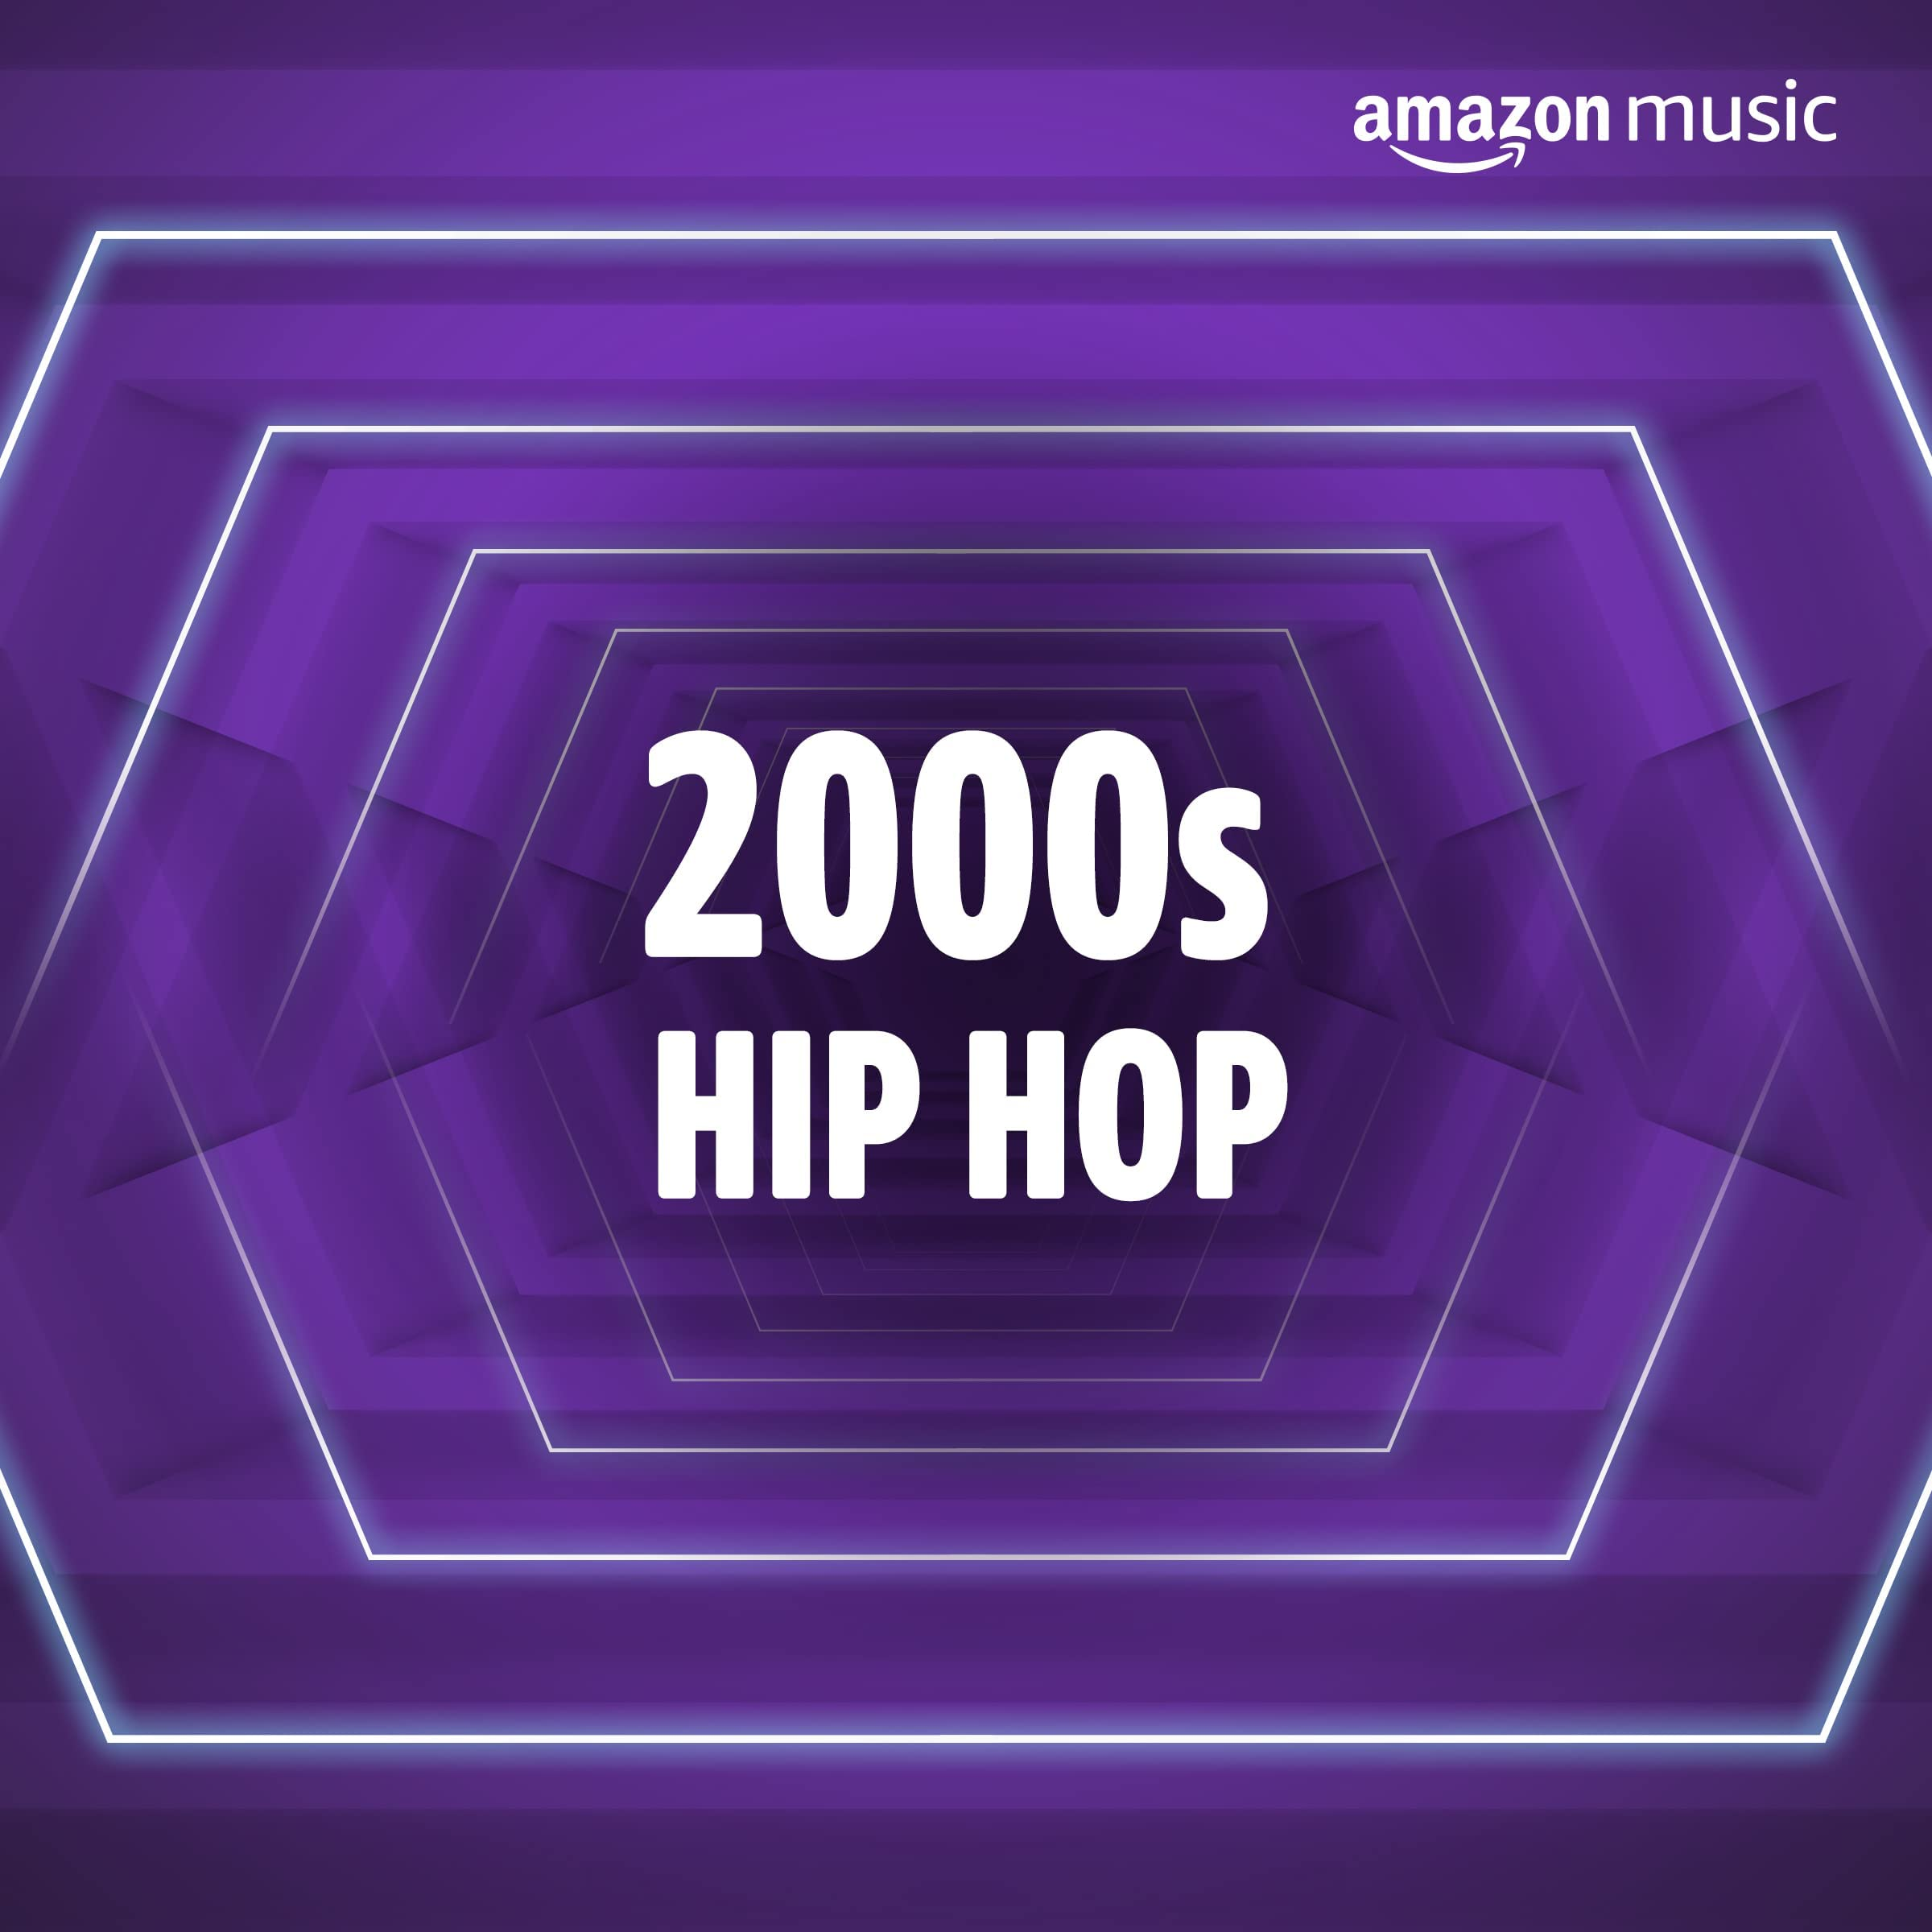 2000s Hip-Hop